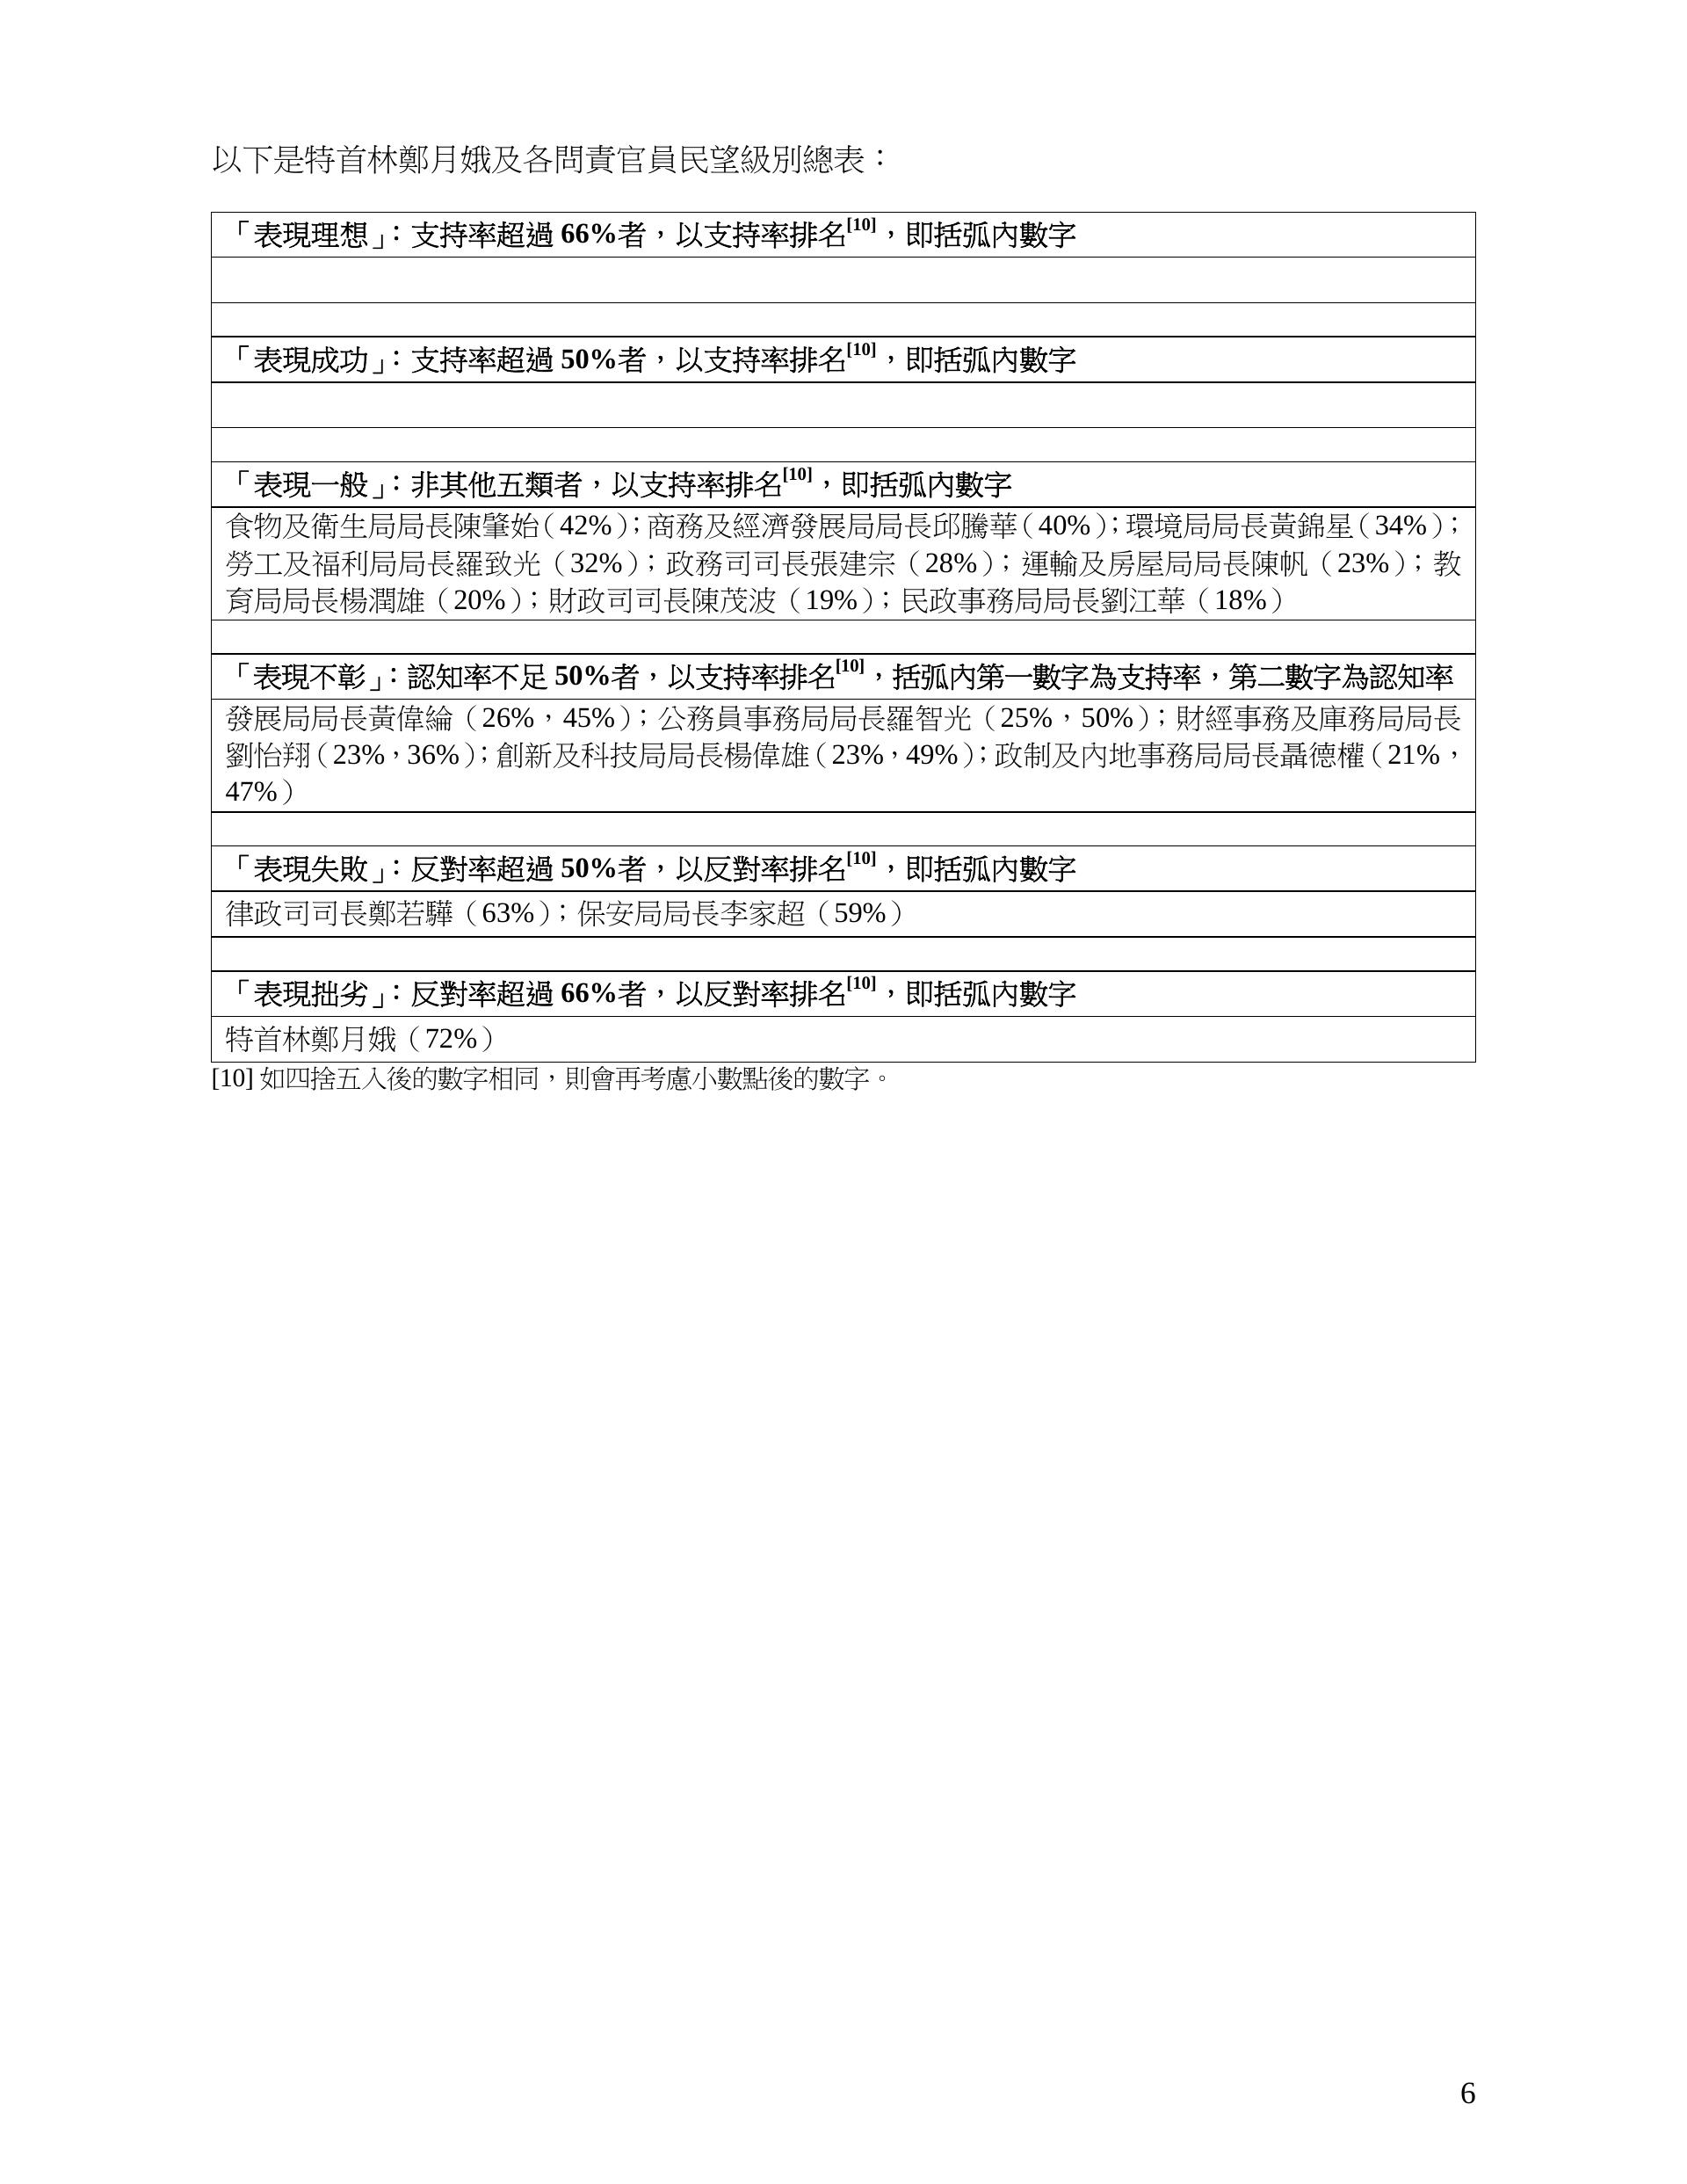 PDFtoJPG.me-06.jpg